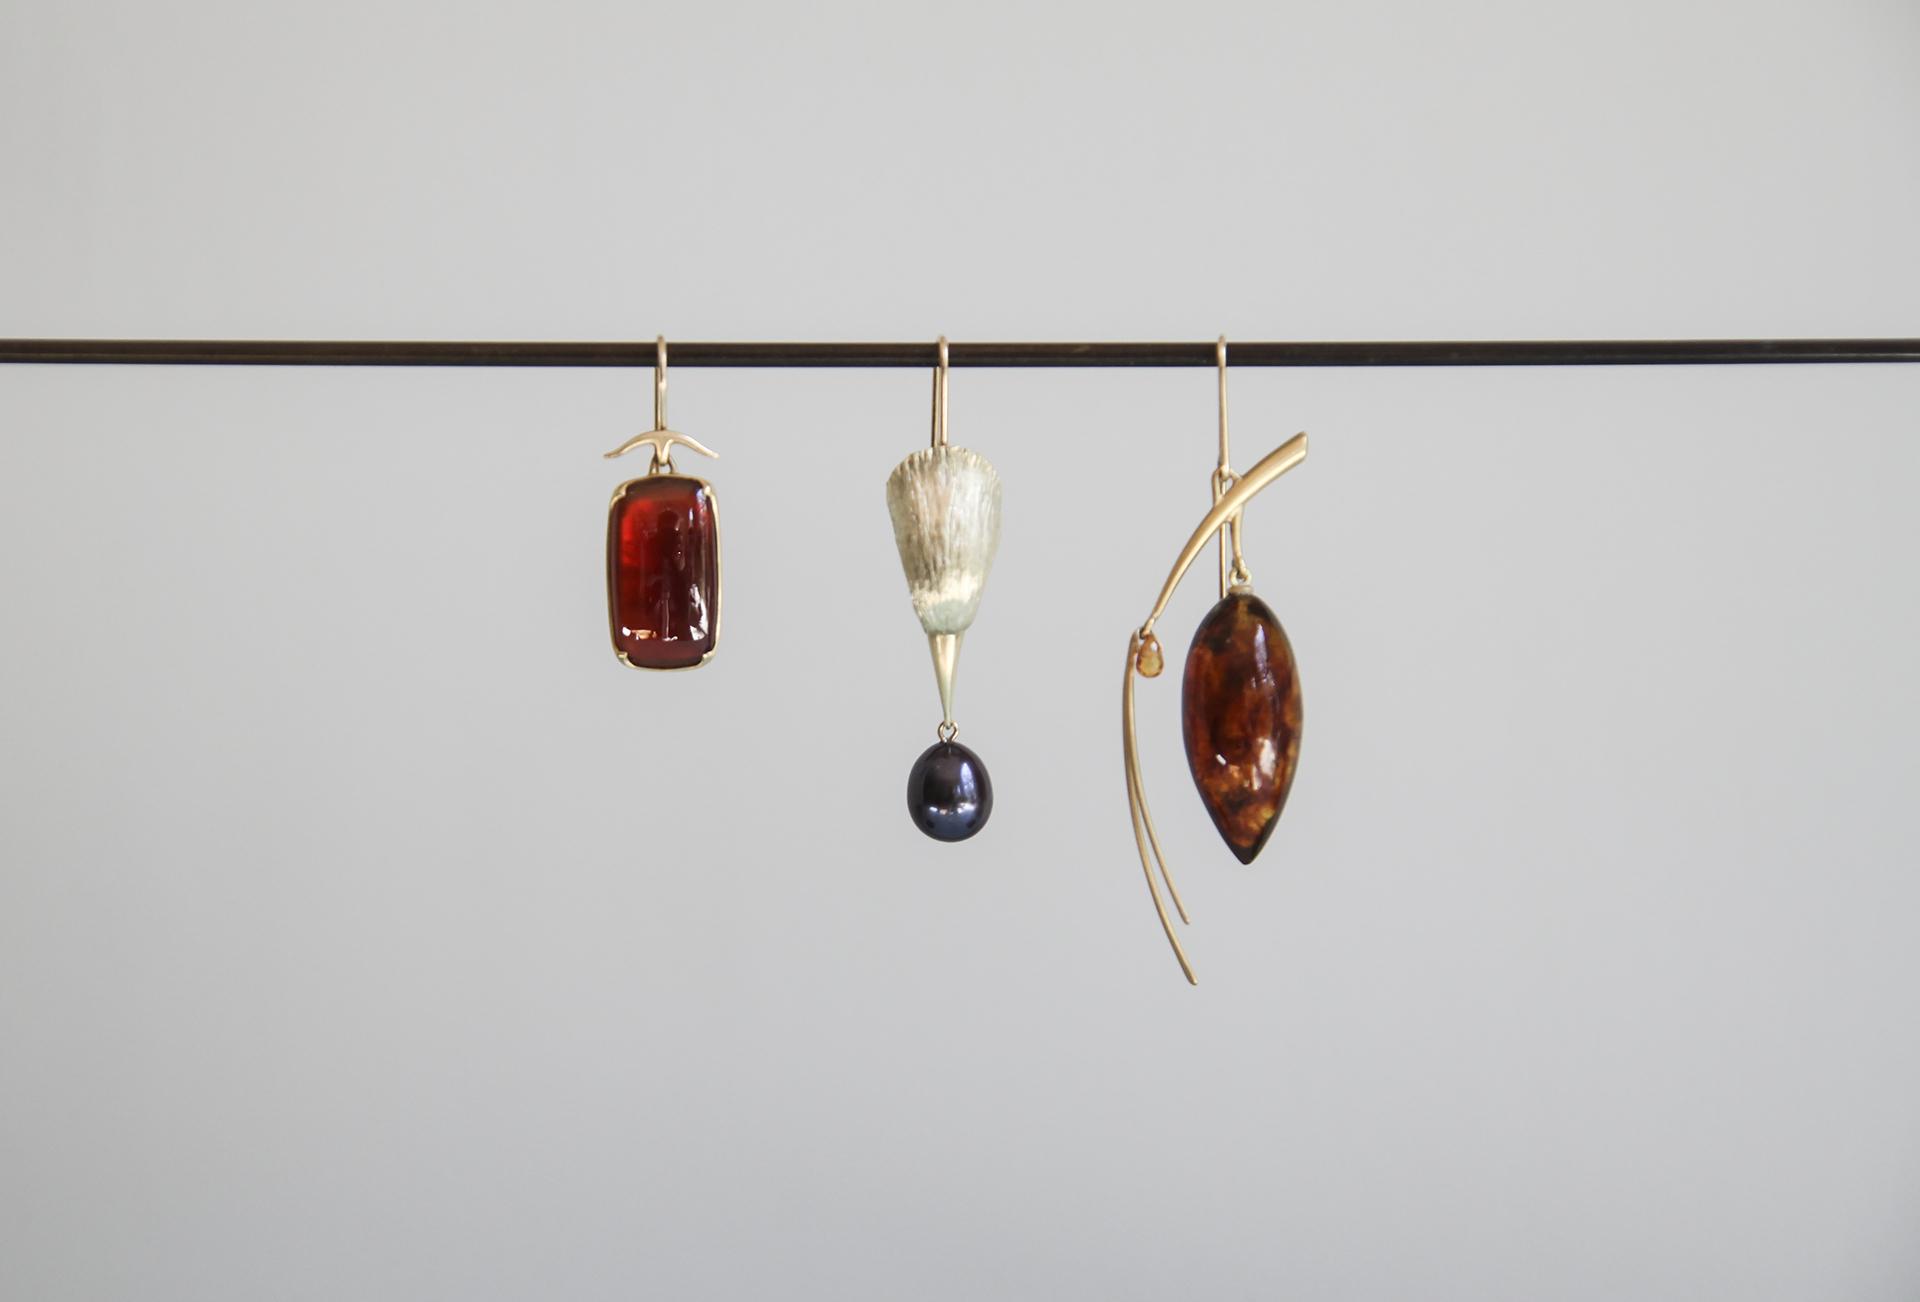 Garnet Rectangular Cabochon Earring,  14k Gold Bird Head Earring with Black Pearl Egg, Amber Pinecone Earring